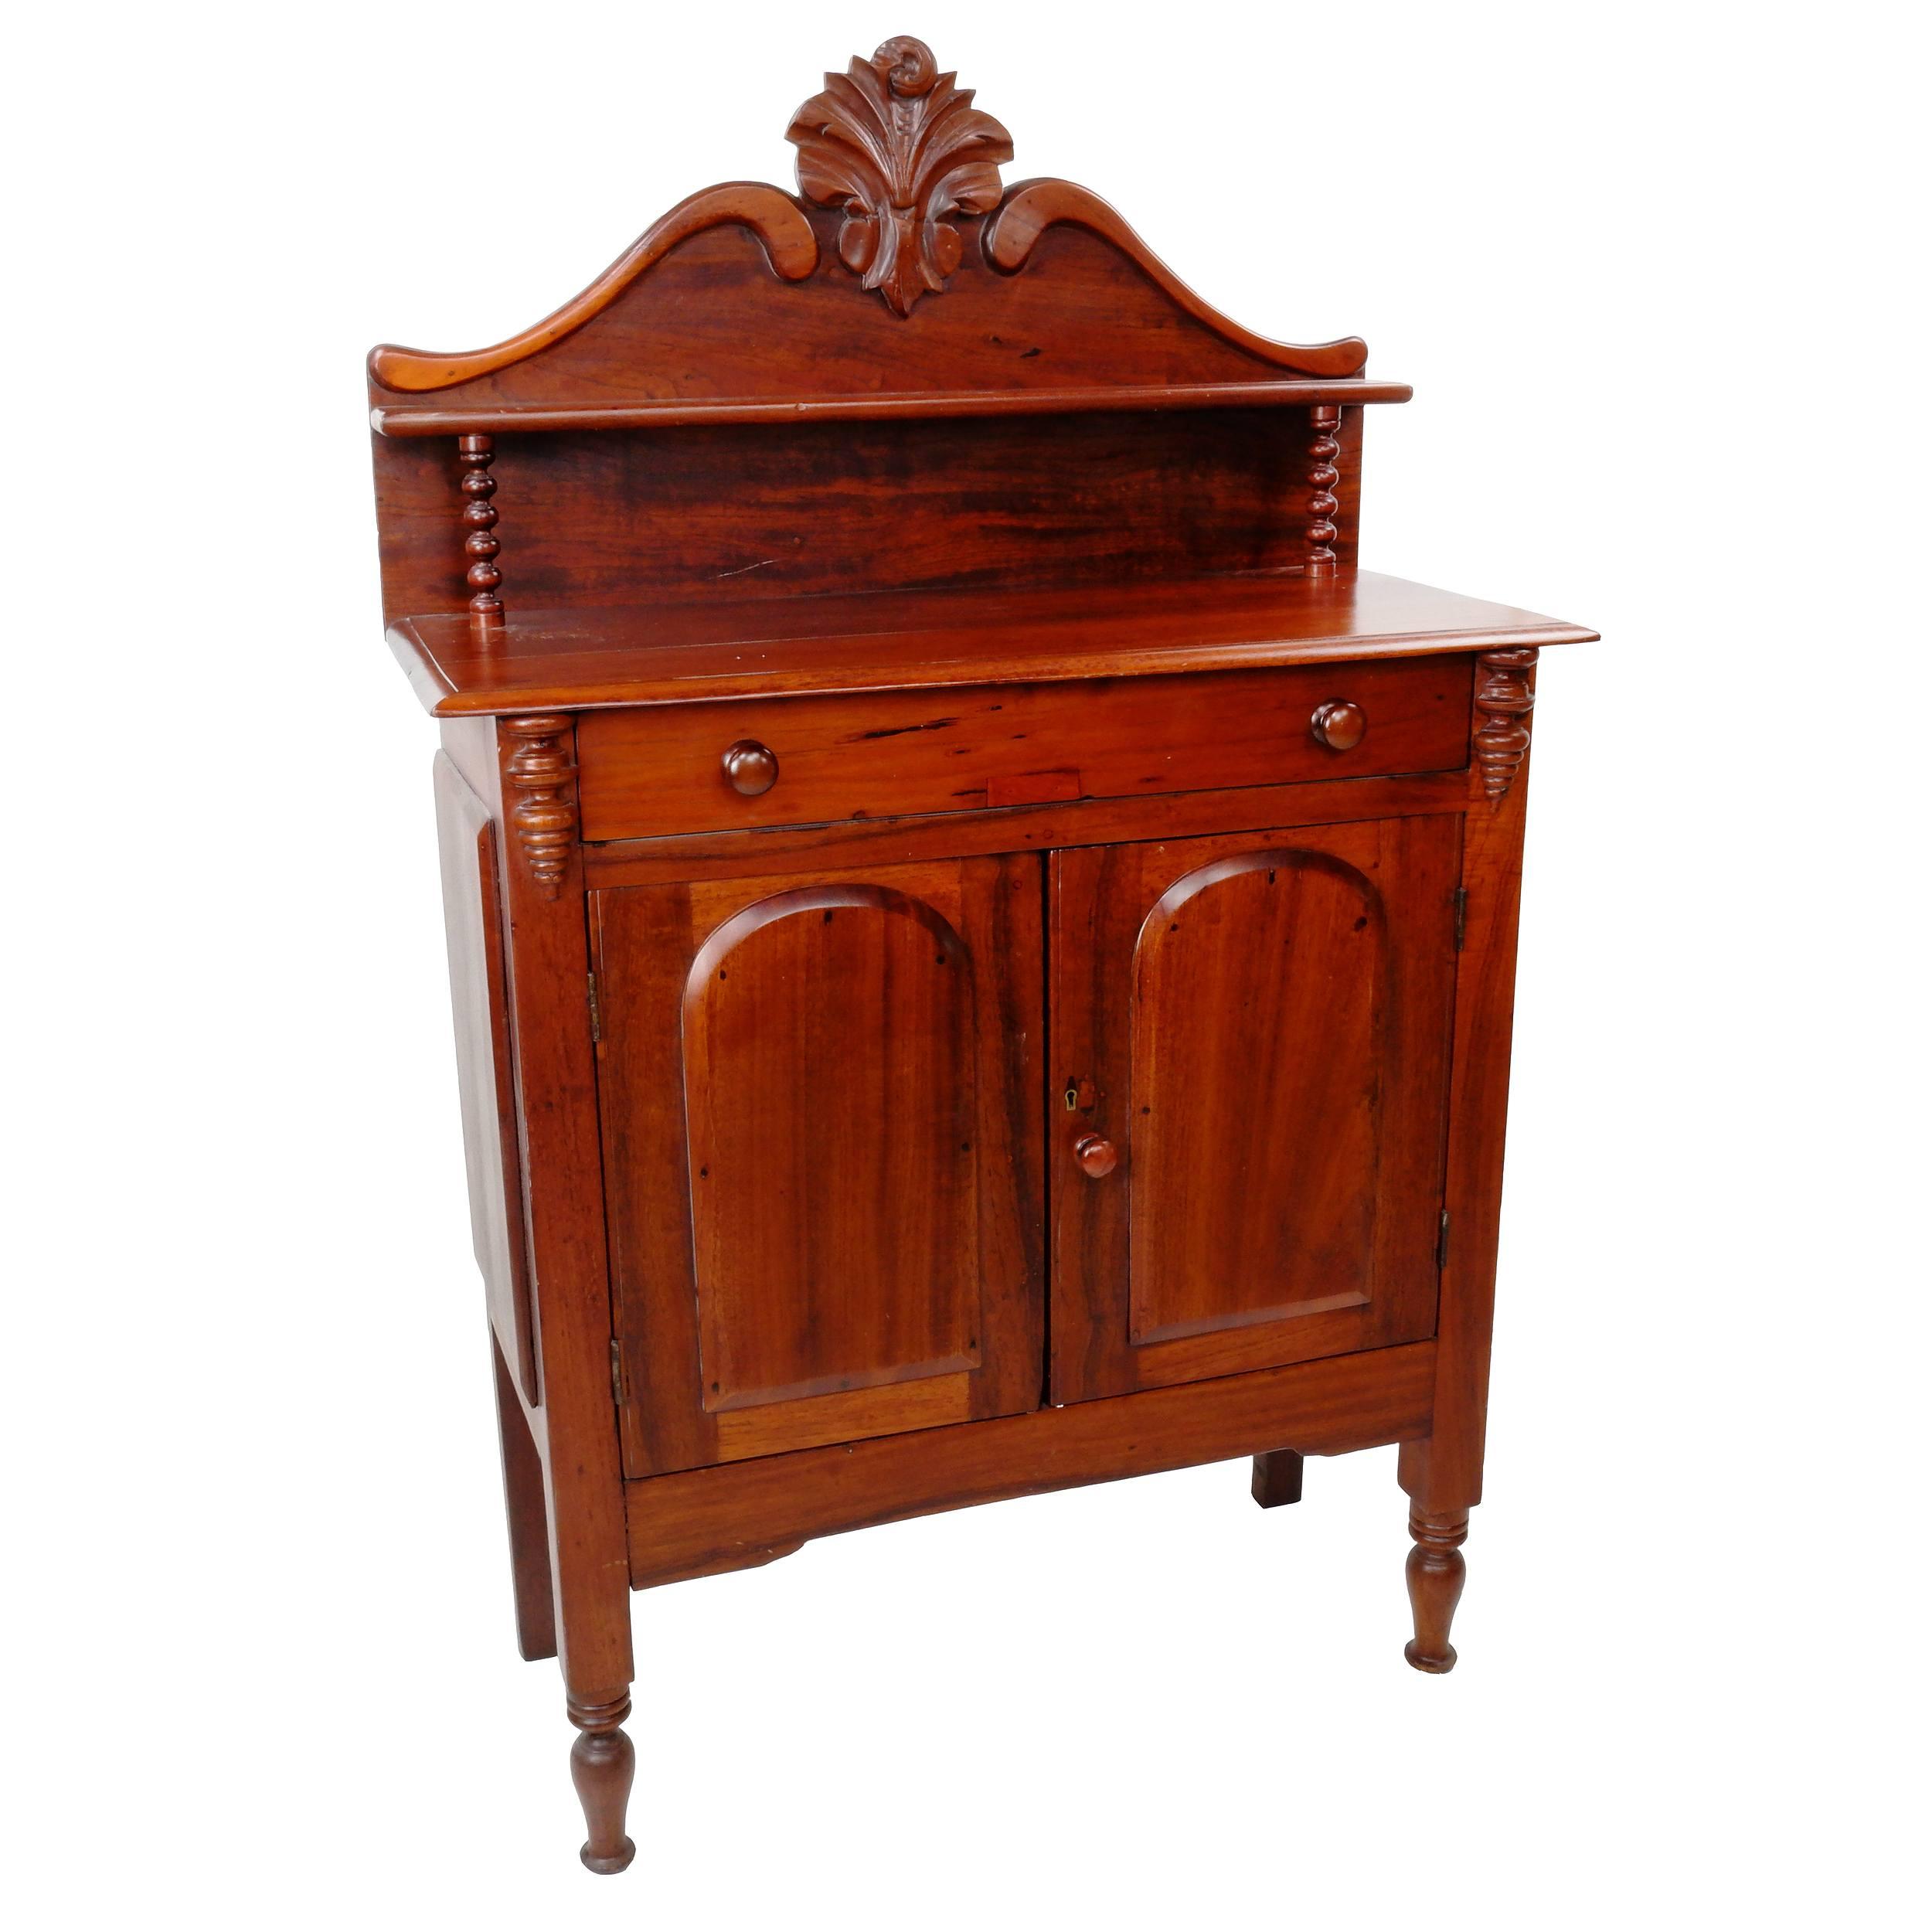 'Antique Australian Cedar Chiffonier, Late 19th Century'